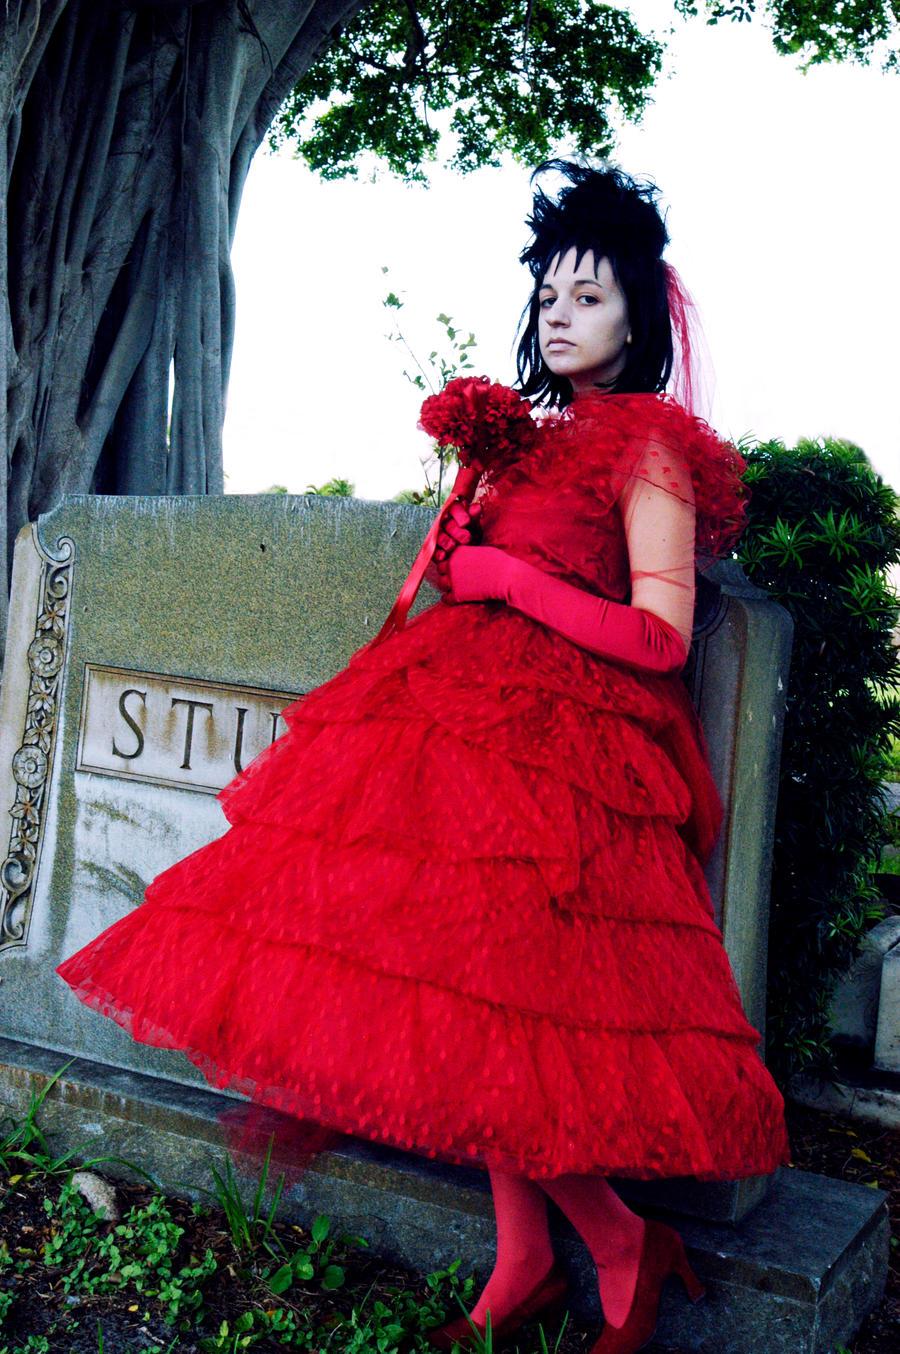 Beetlejuice 01 by pink royale on deviantart for Lydia deetz wedding dress